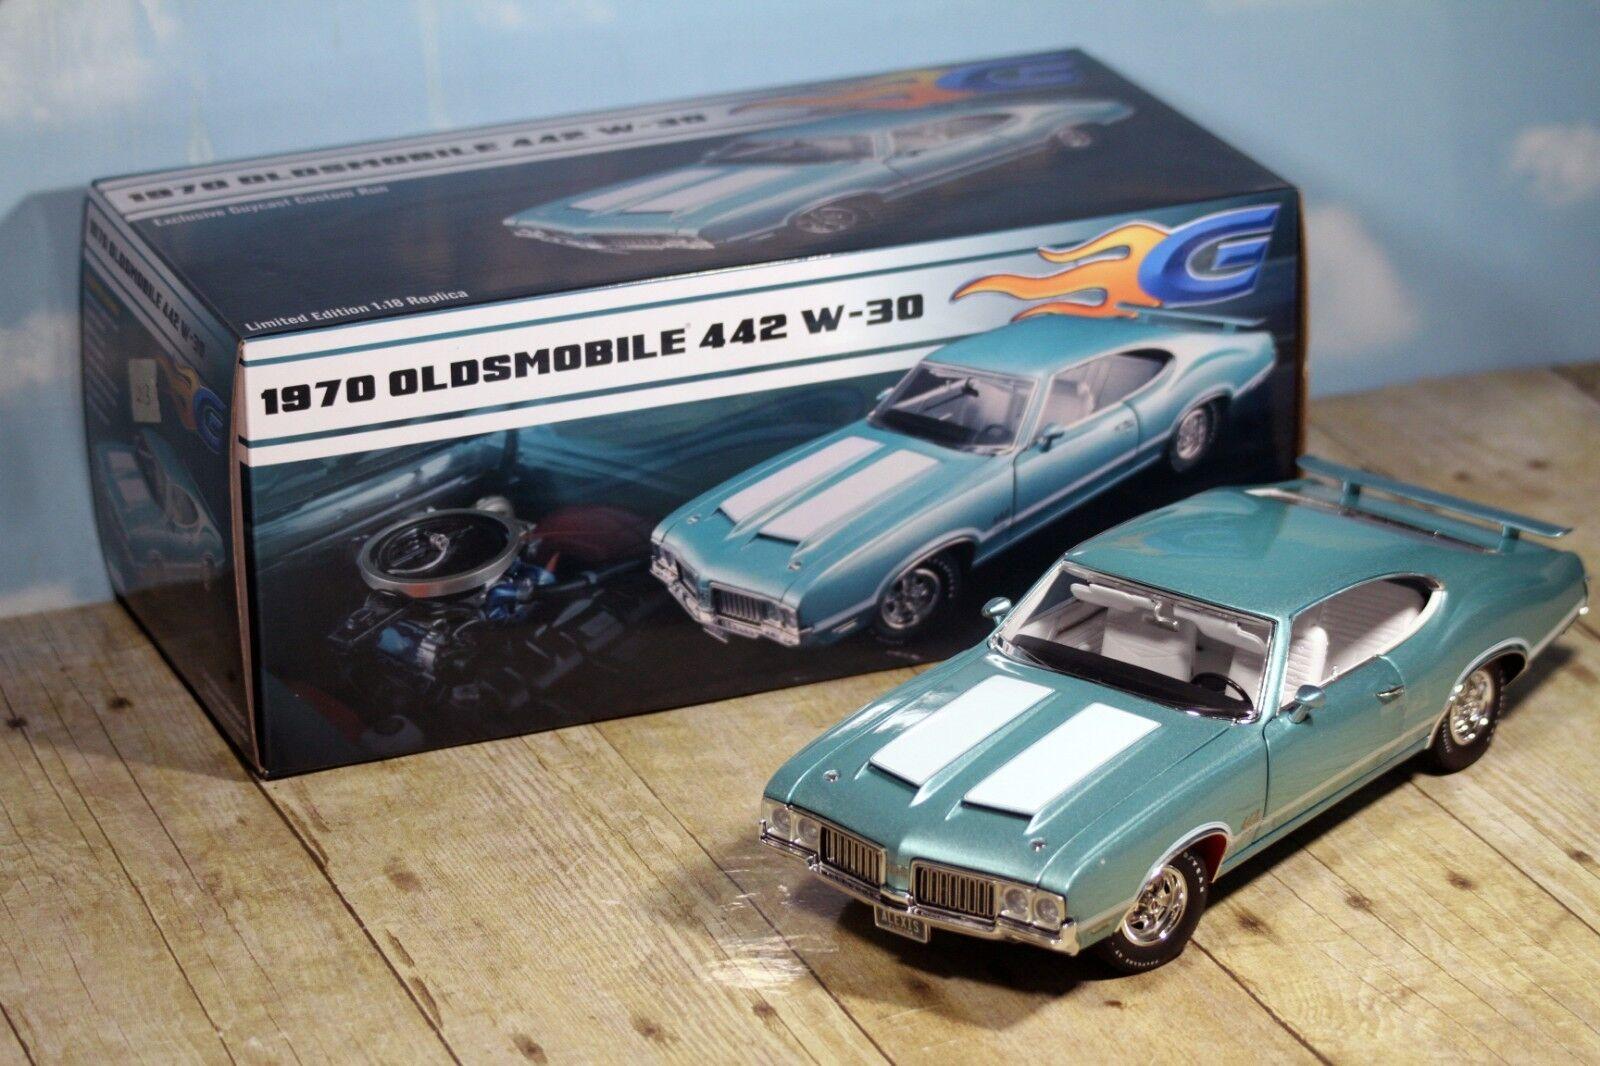 Acme GuyCast 1970 Oldsmobile Cutlass 442 W-30 W-30 W-30 Reef Turquoise 1 18 A1805610 110c3e